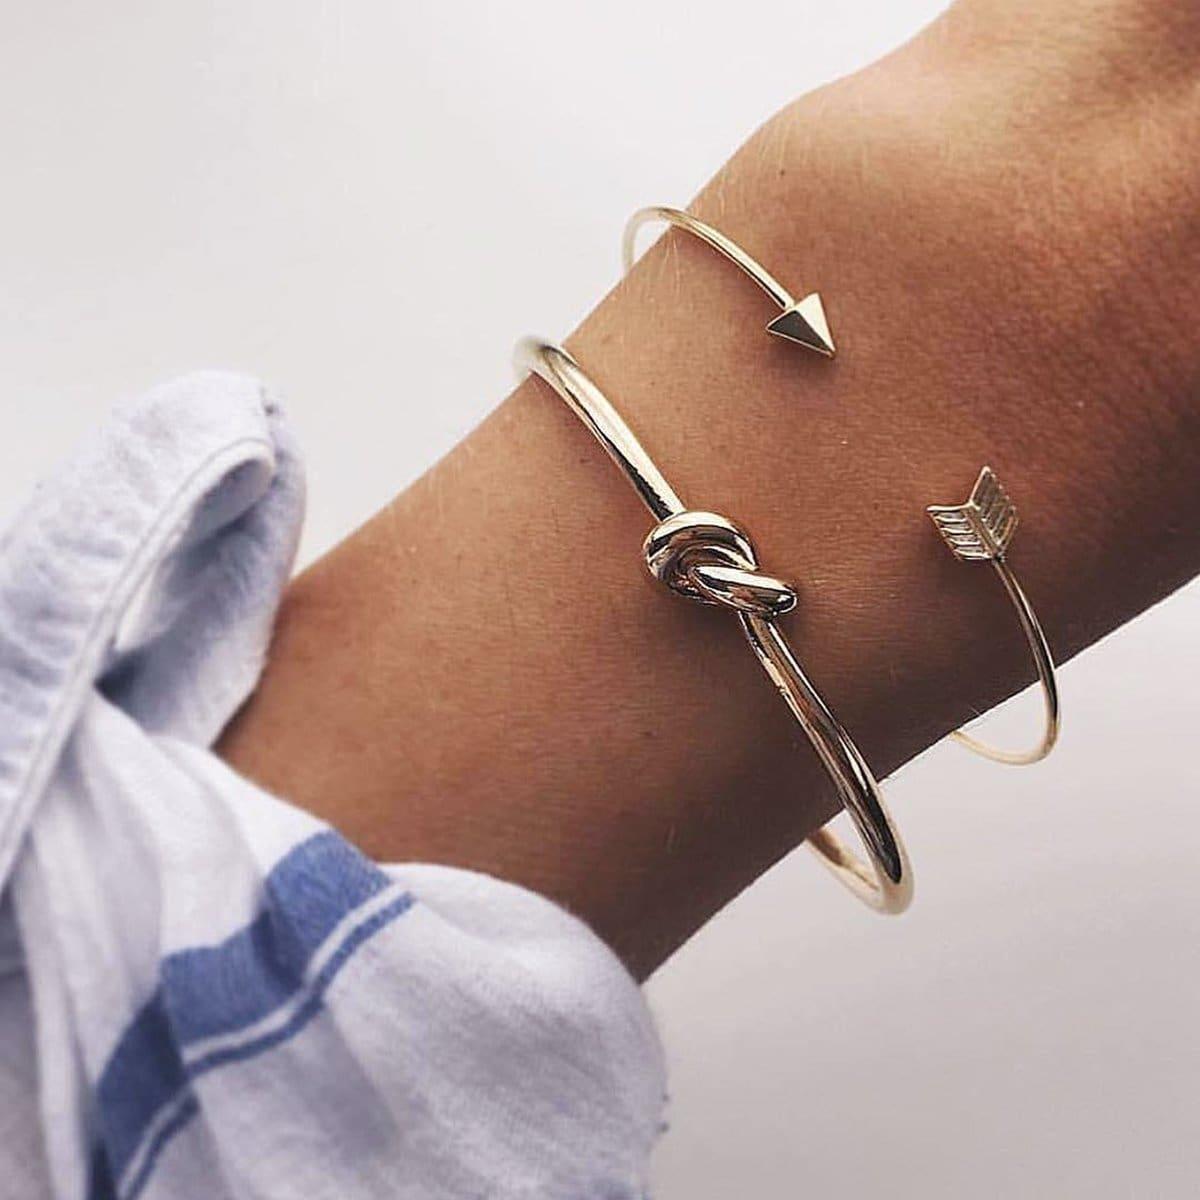 Arrow & Twist Detail Cuff Bracelet Set 2pcs